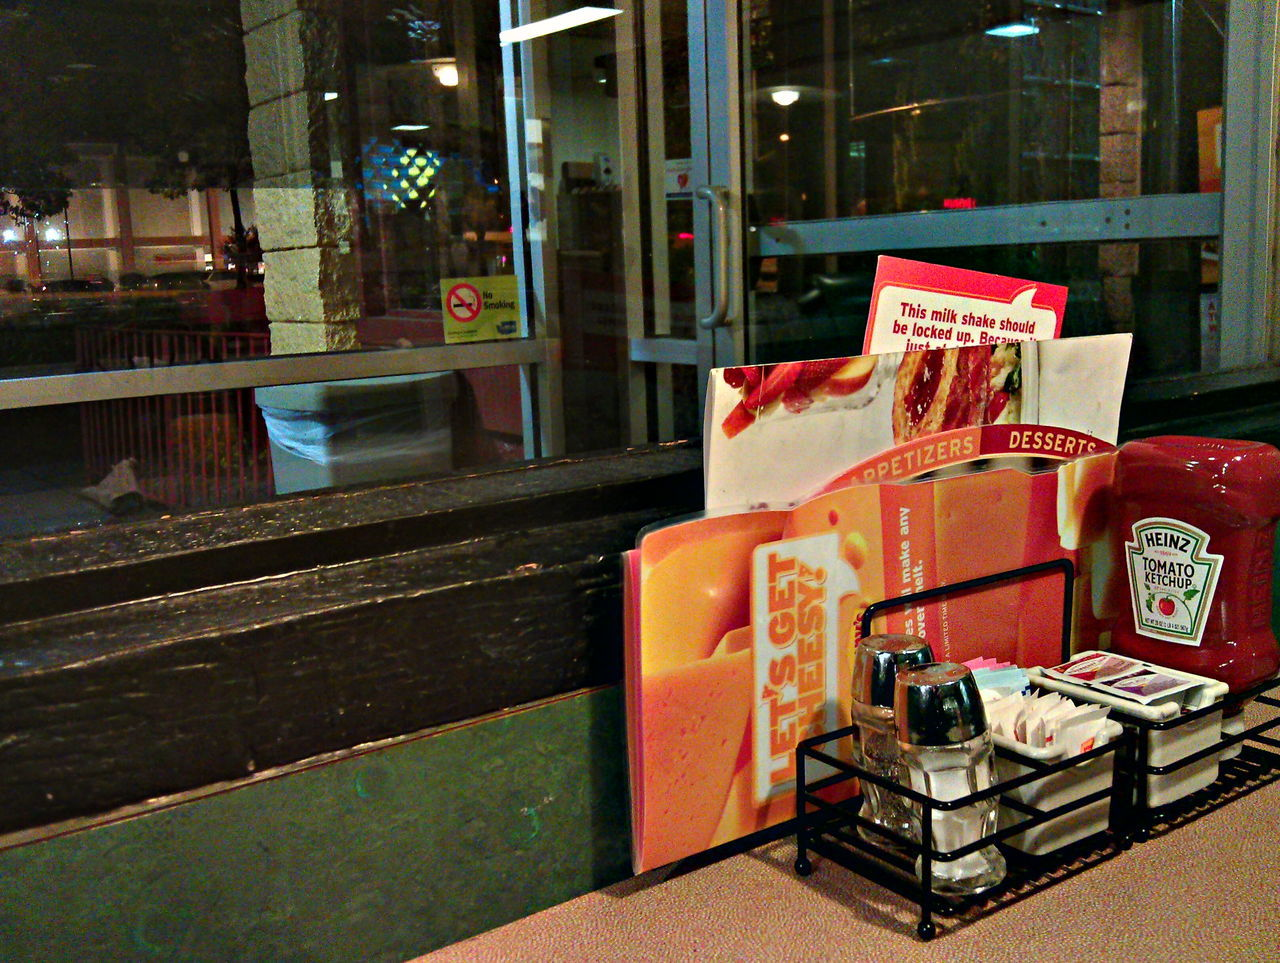 Photo taken with HTC Sensation Denny's Htc Sensation Window